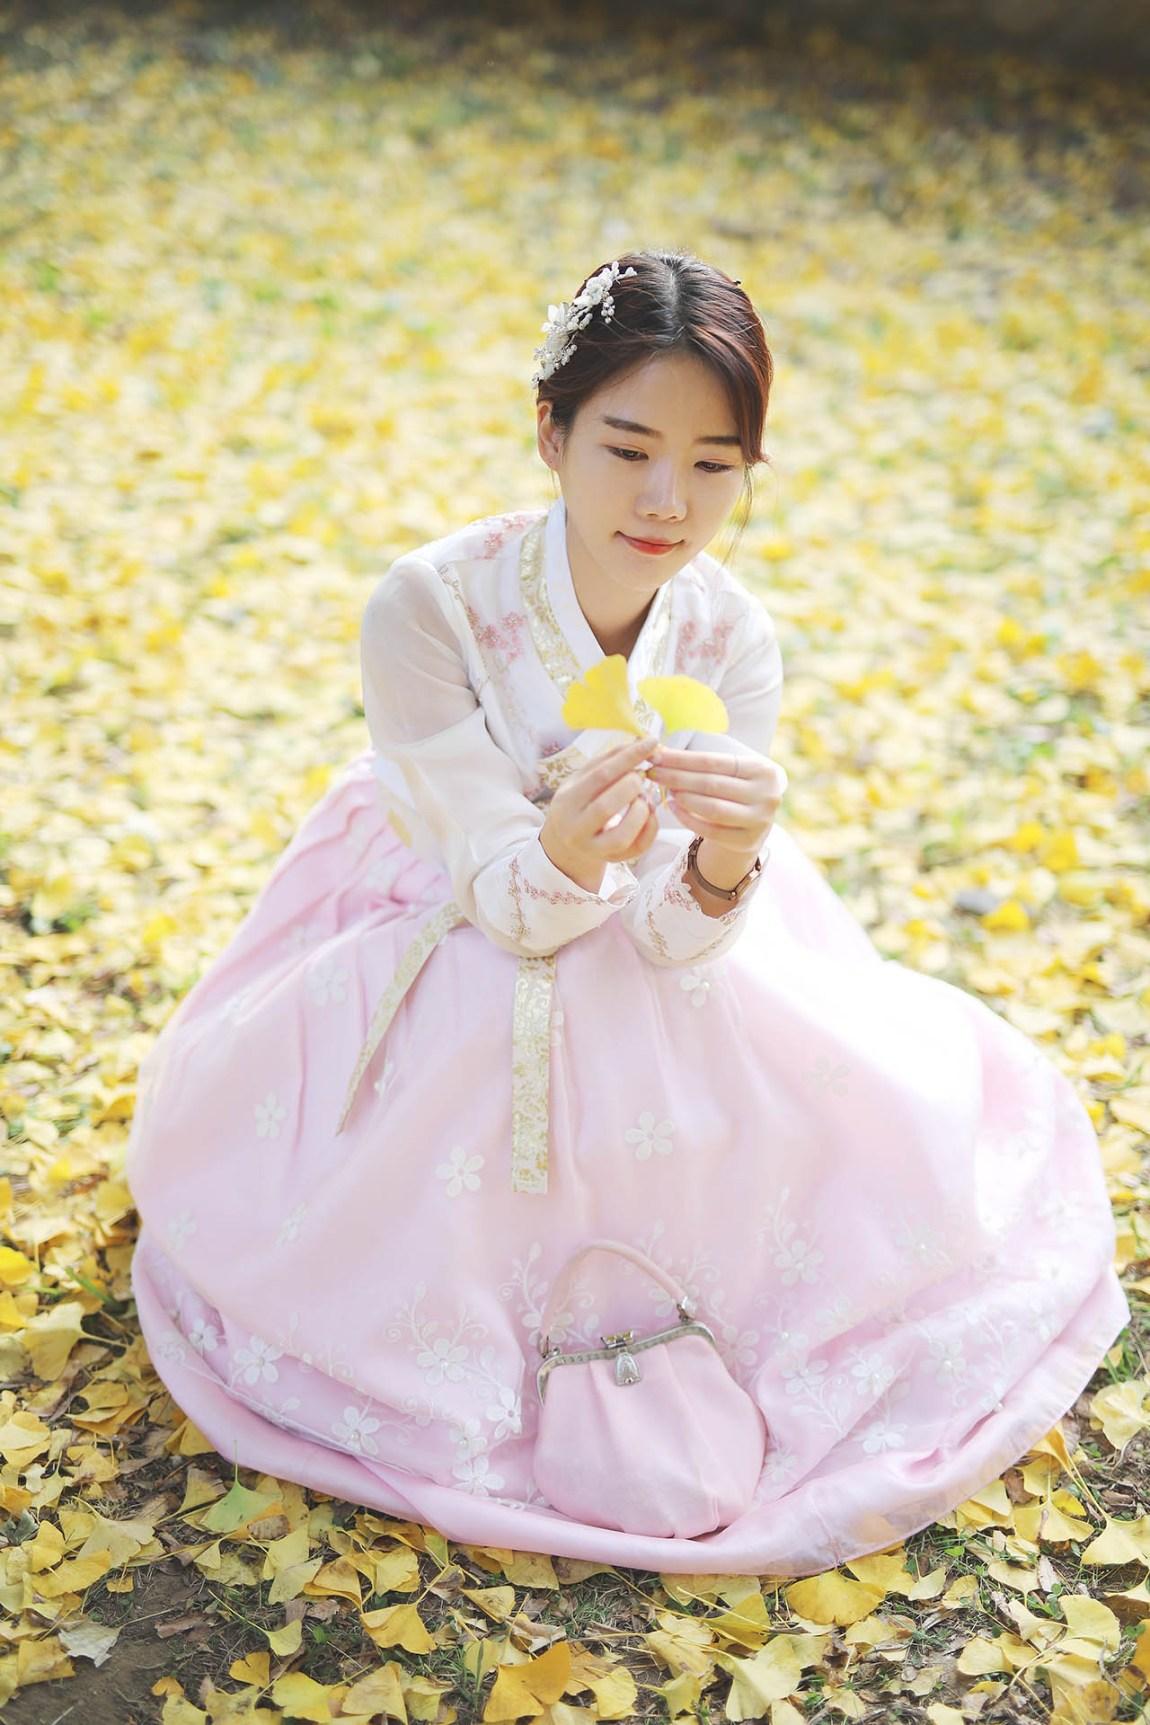 #1 travel destination to enjoy autumn foliage - 'Hyanggyo' of Jeonju Hanok Village